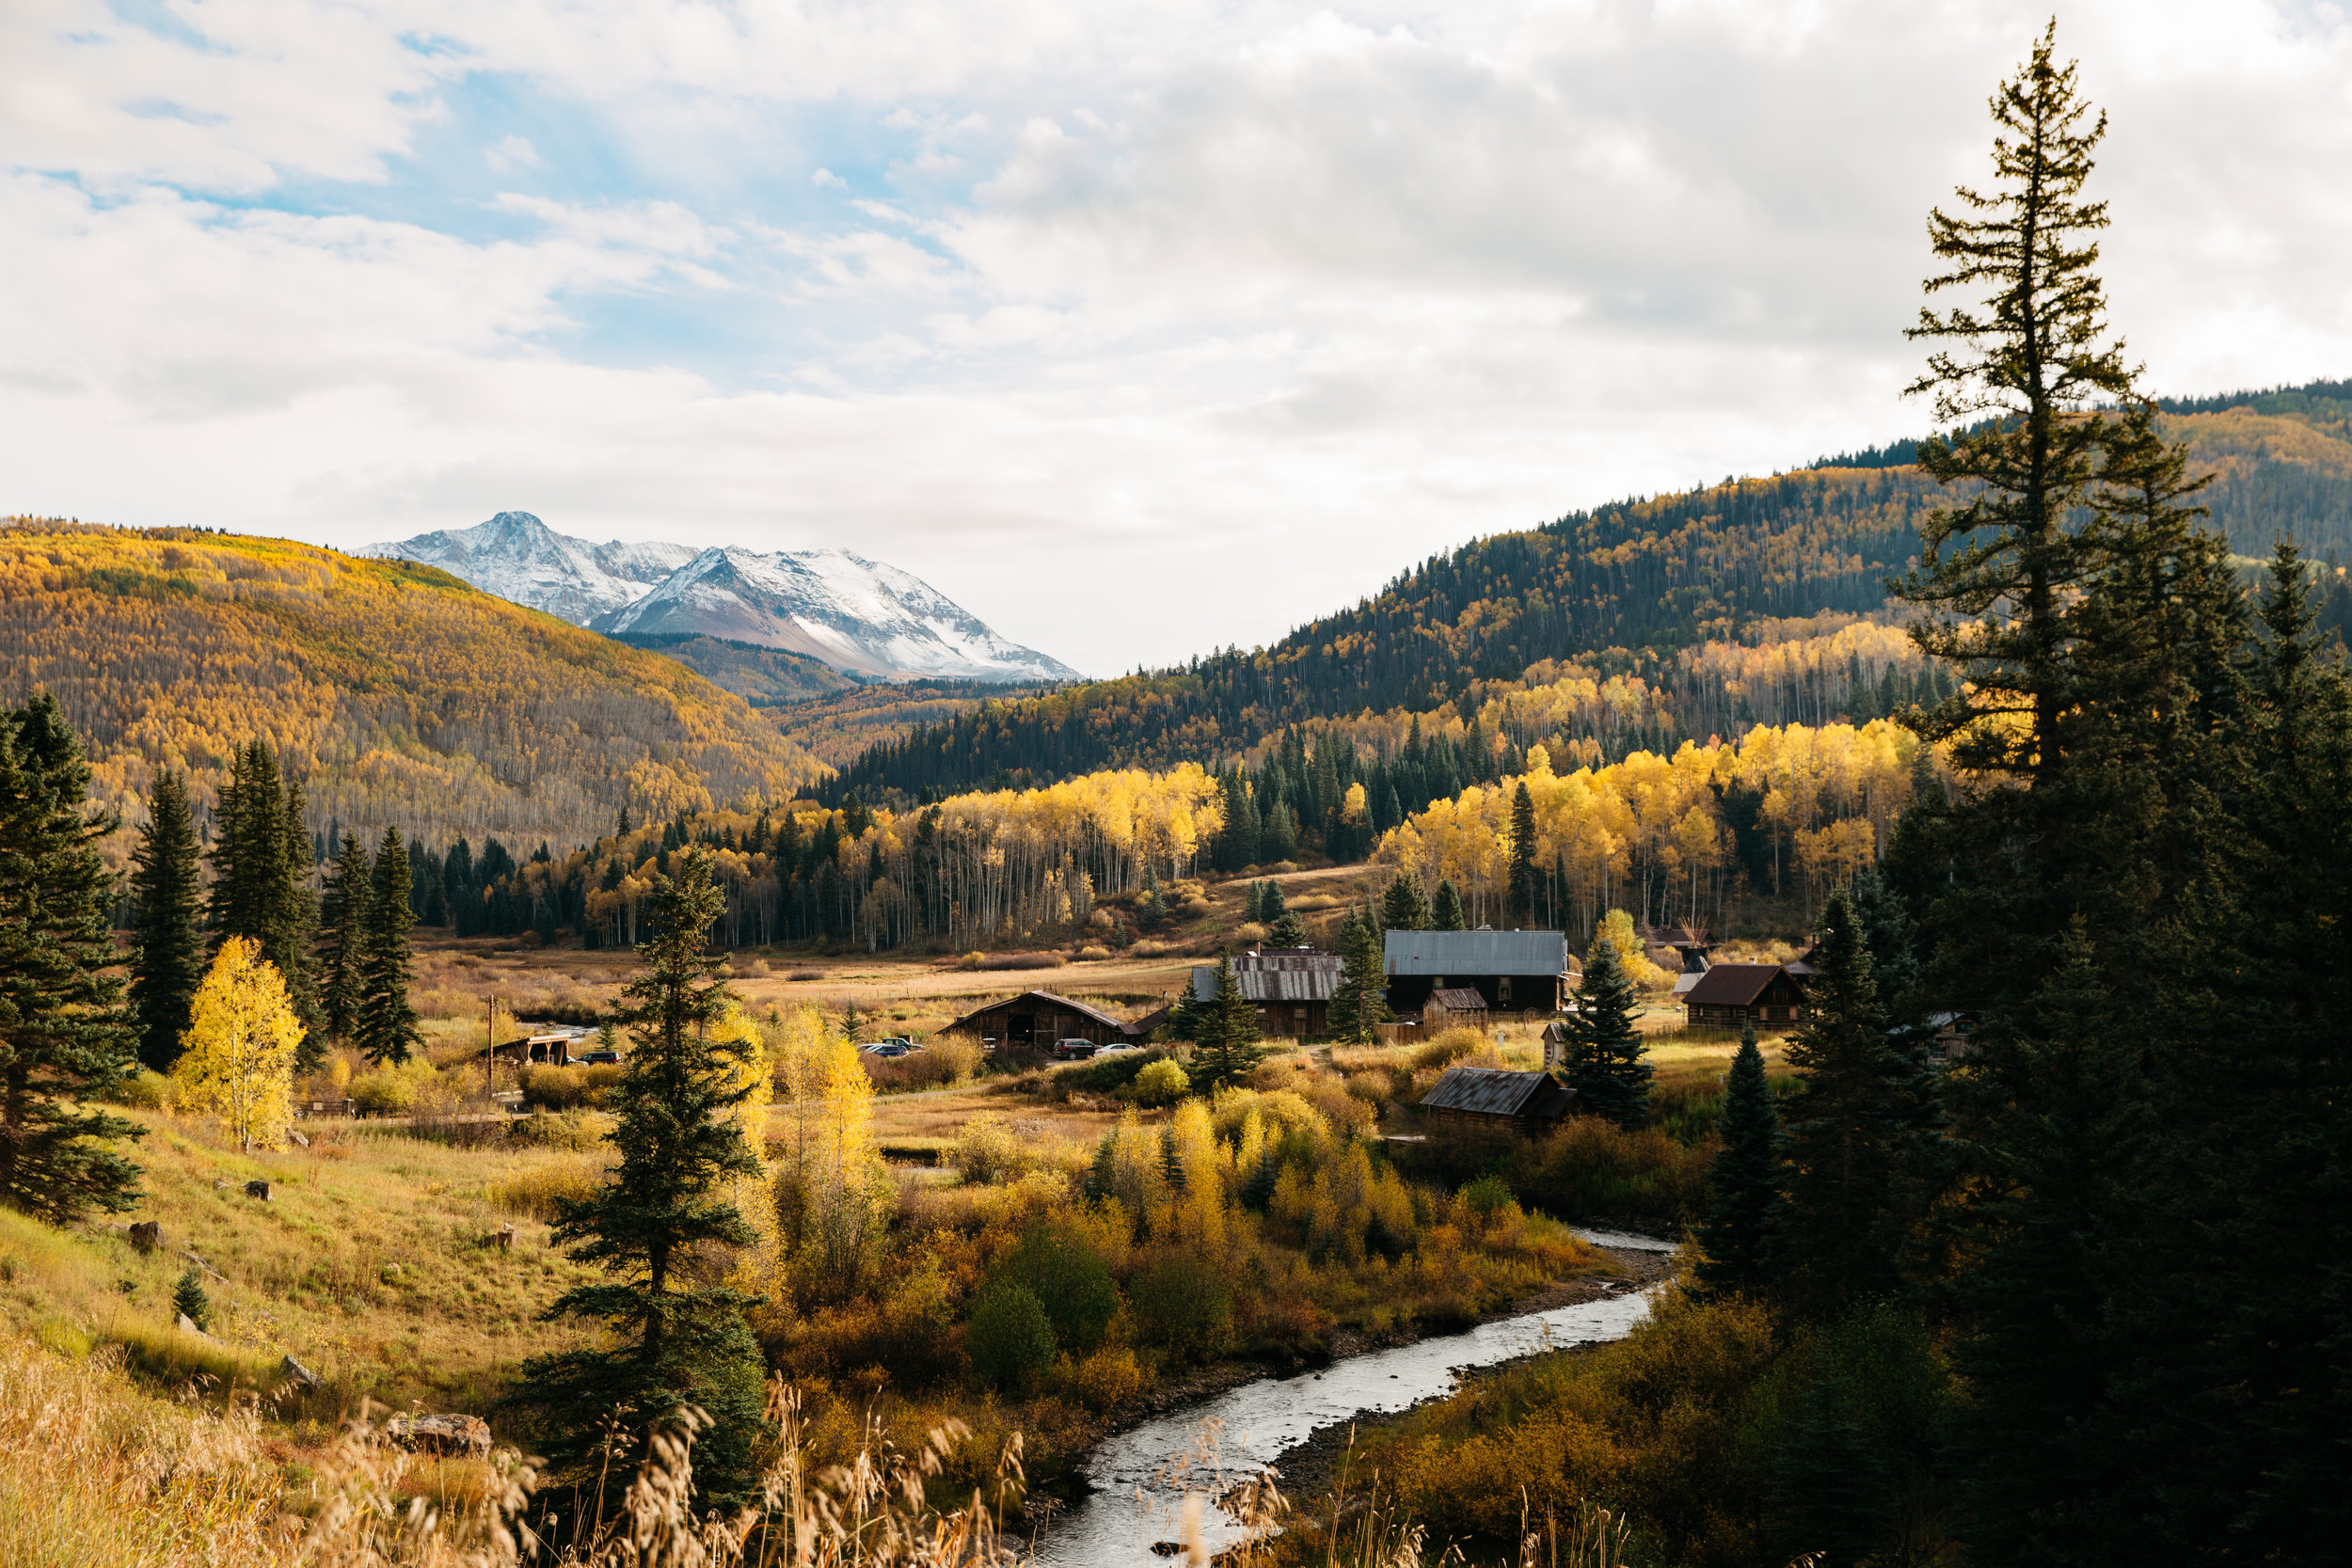 Wild Mountain Colorado Image.jpg